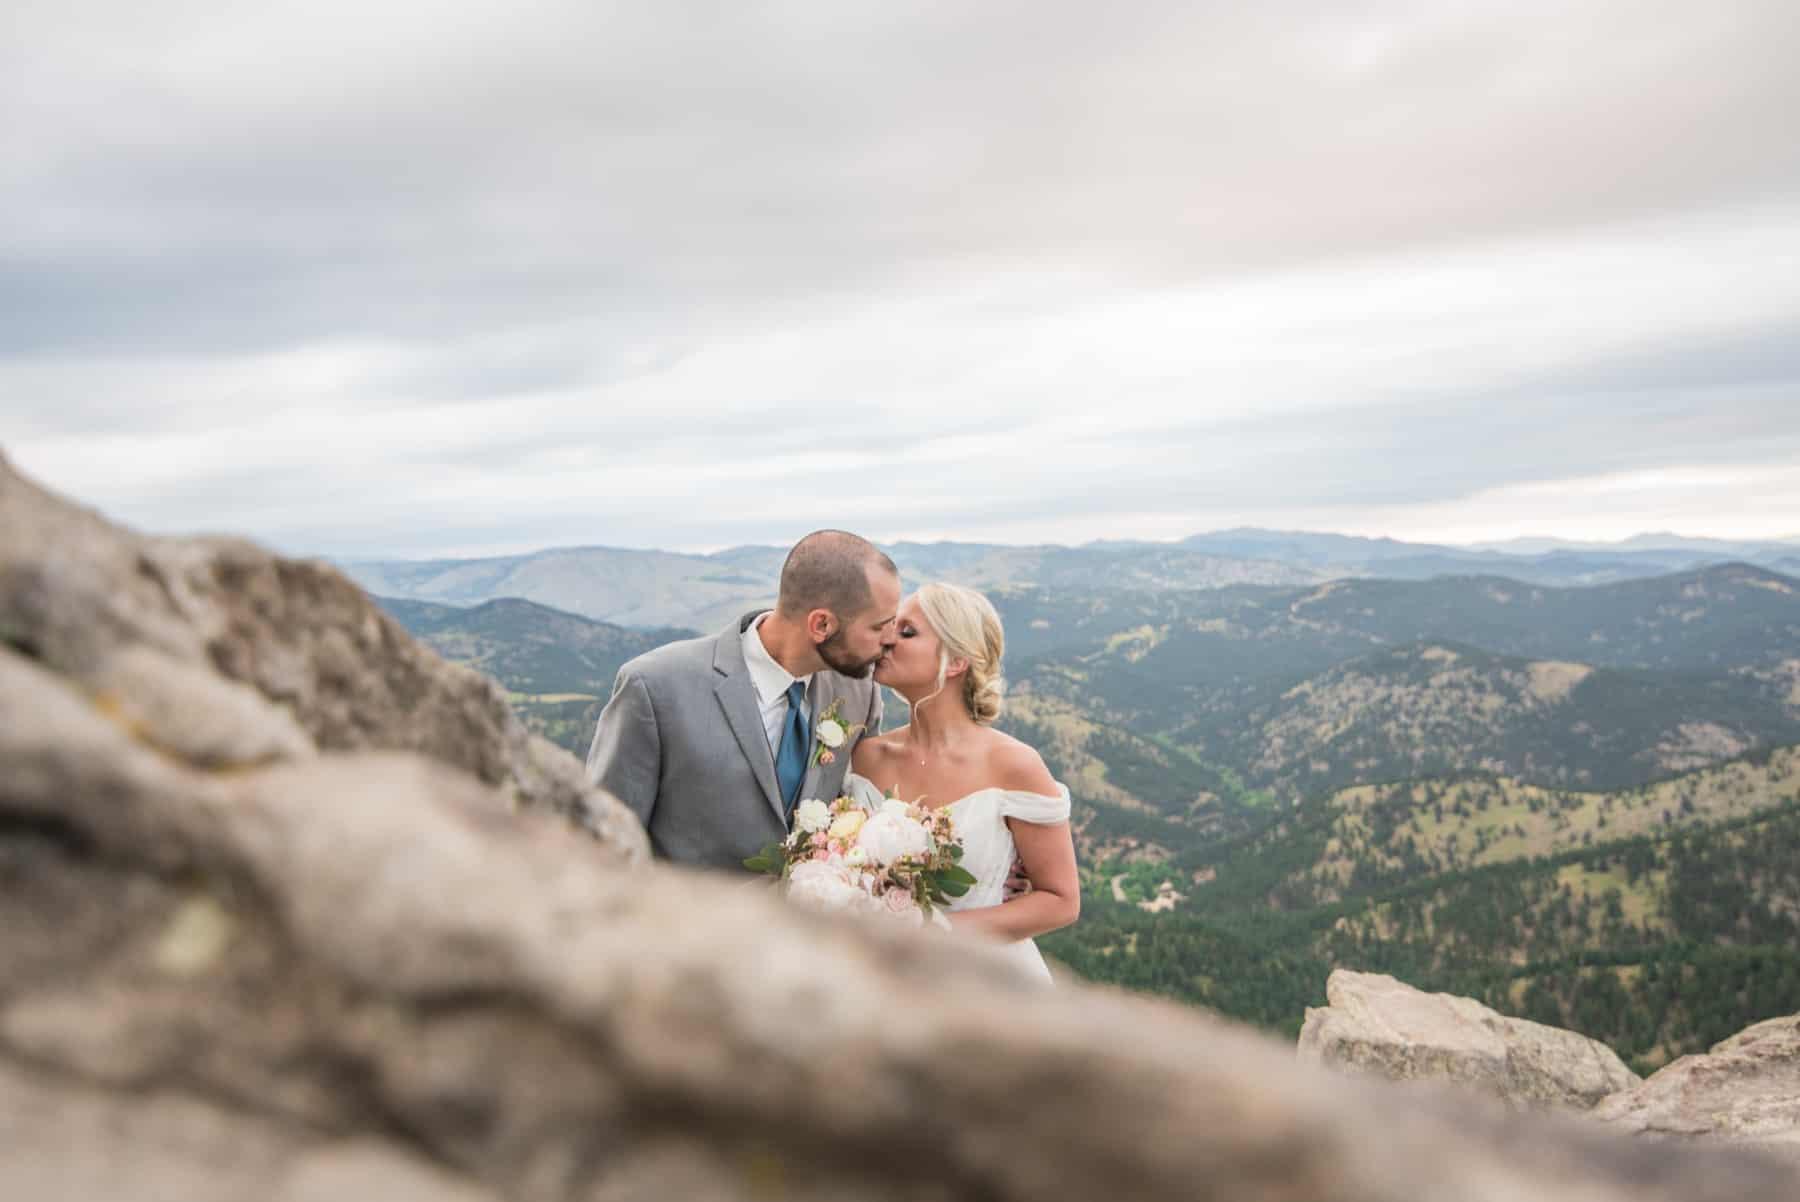 Kayla & Jason's Rocky Mountain Adventure Wedding in Boulder, Colorado